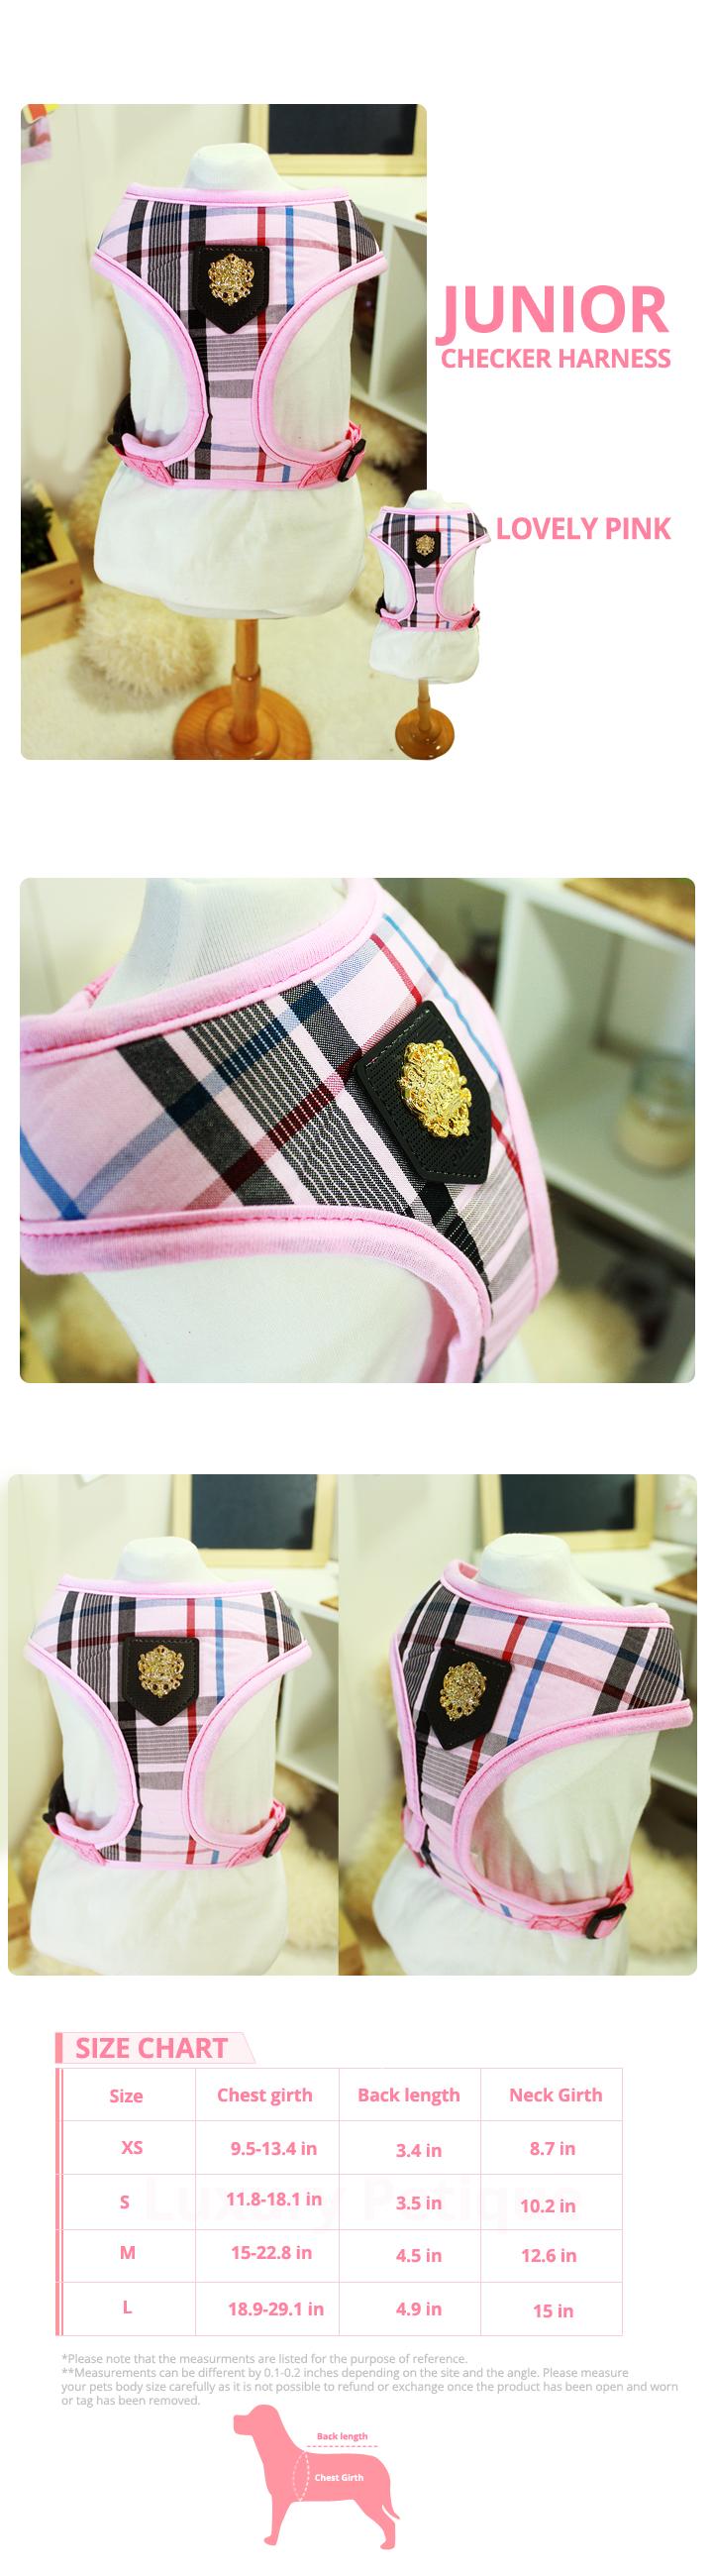 junior-harness-2.png